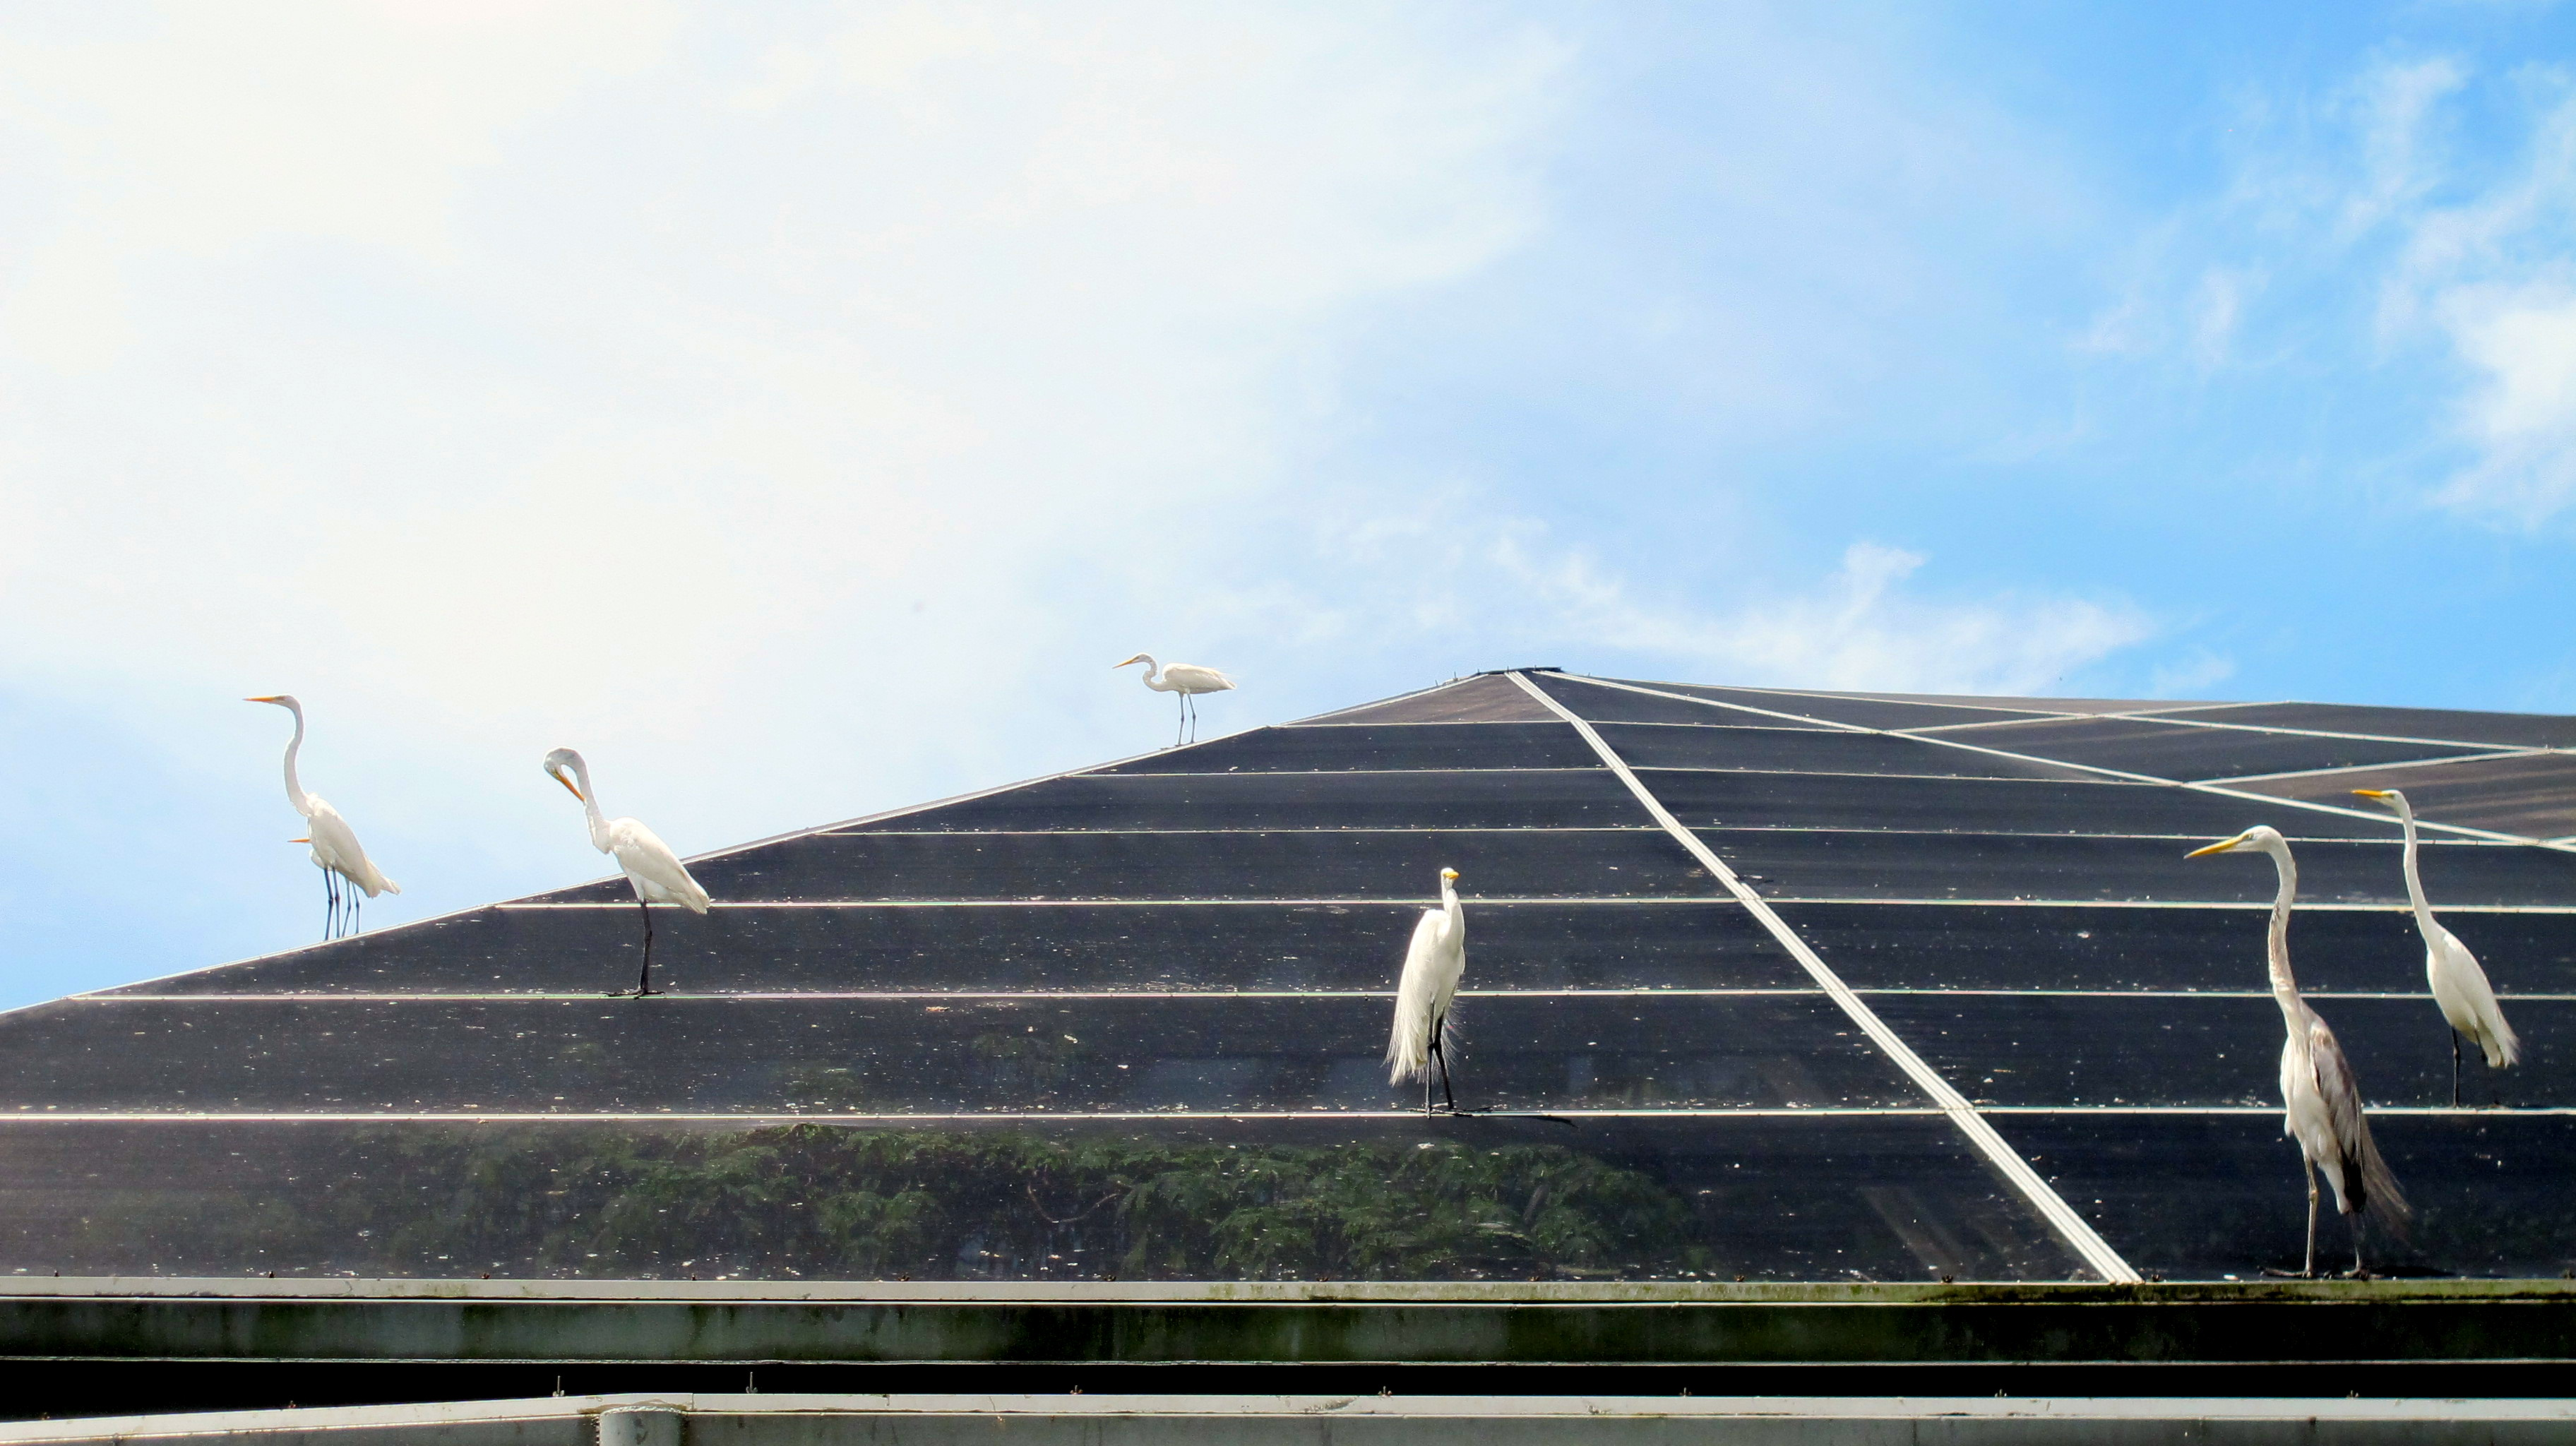 IMG_1215_Egrets_roof_Belem